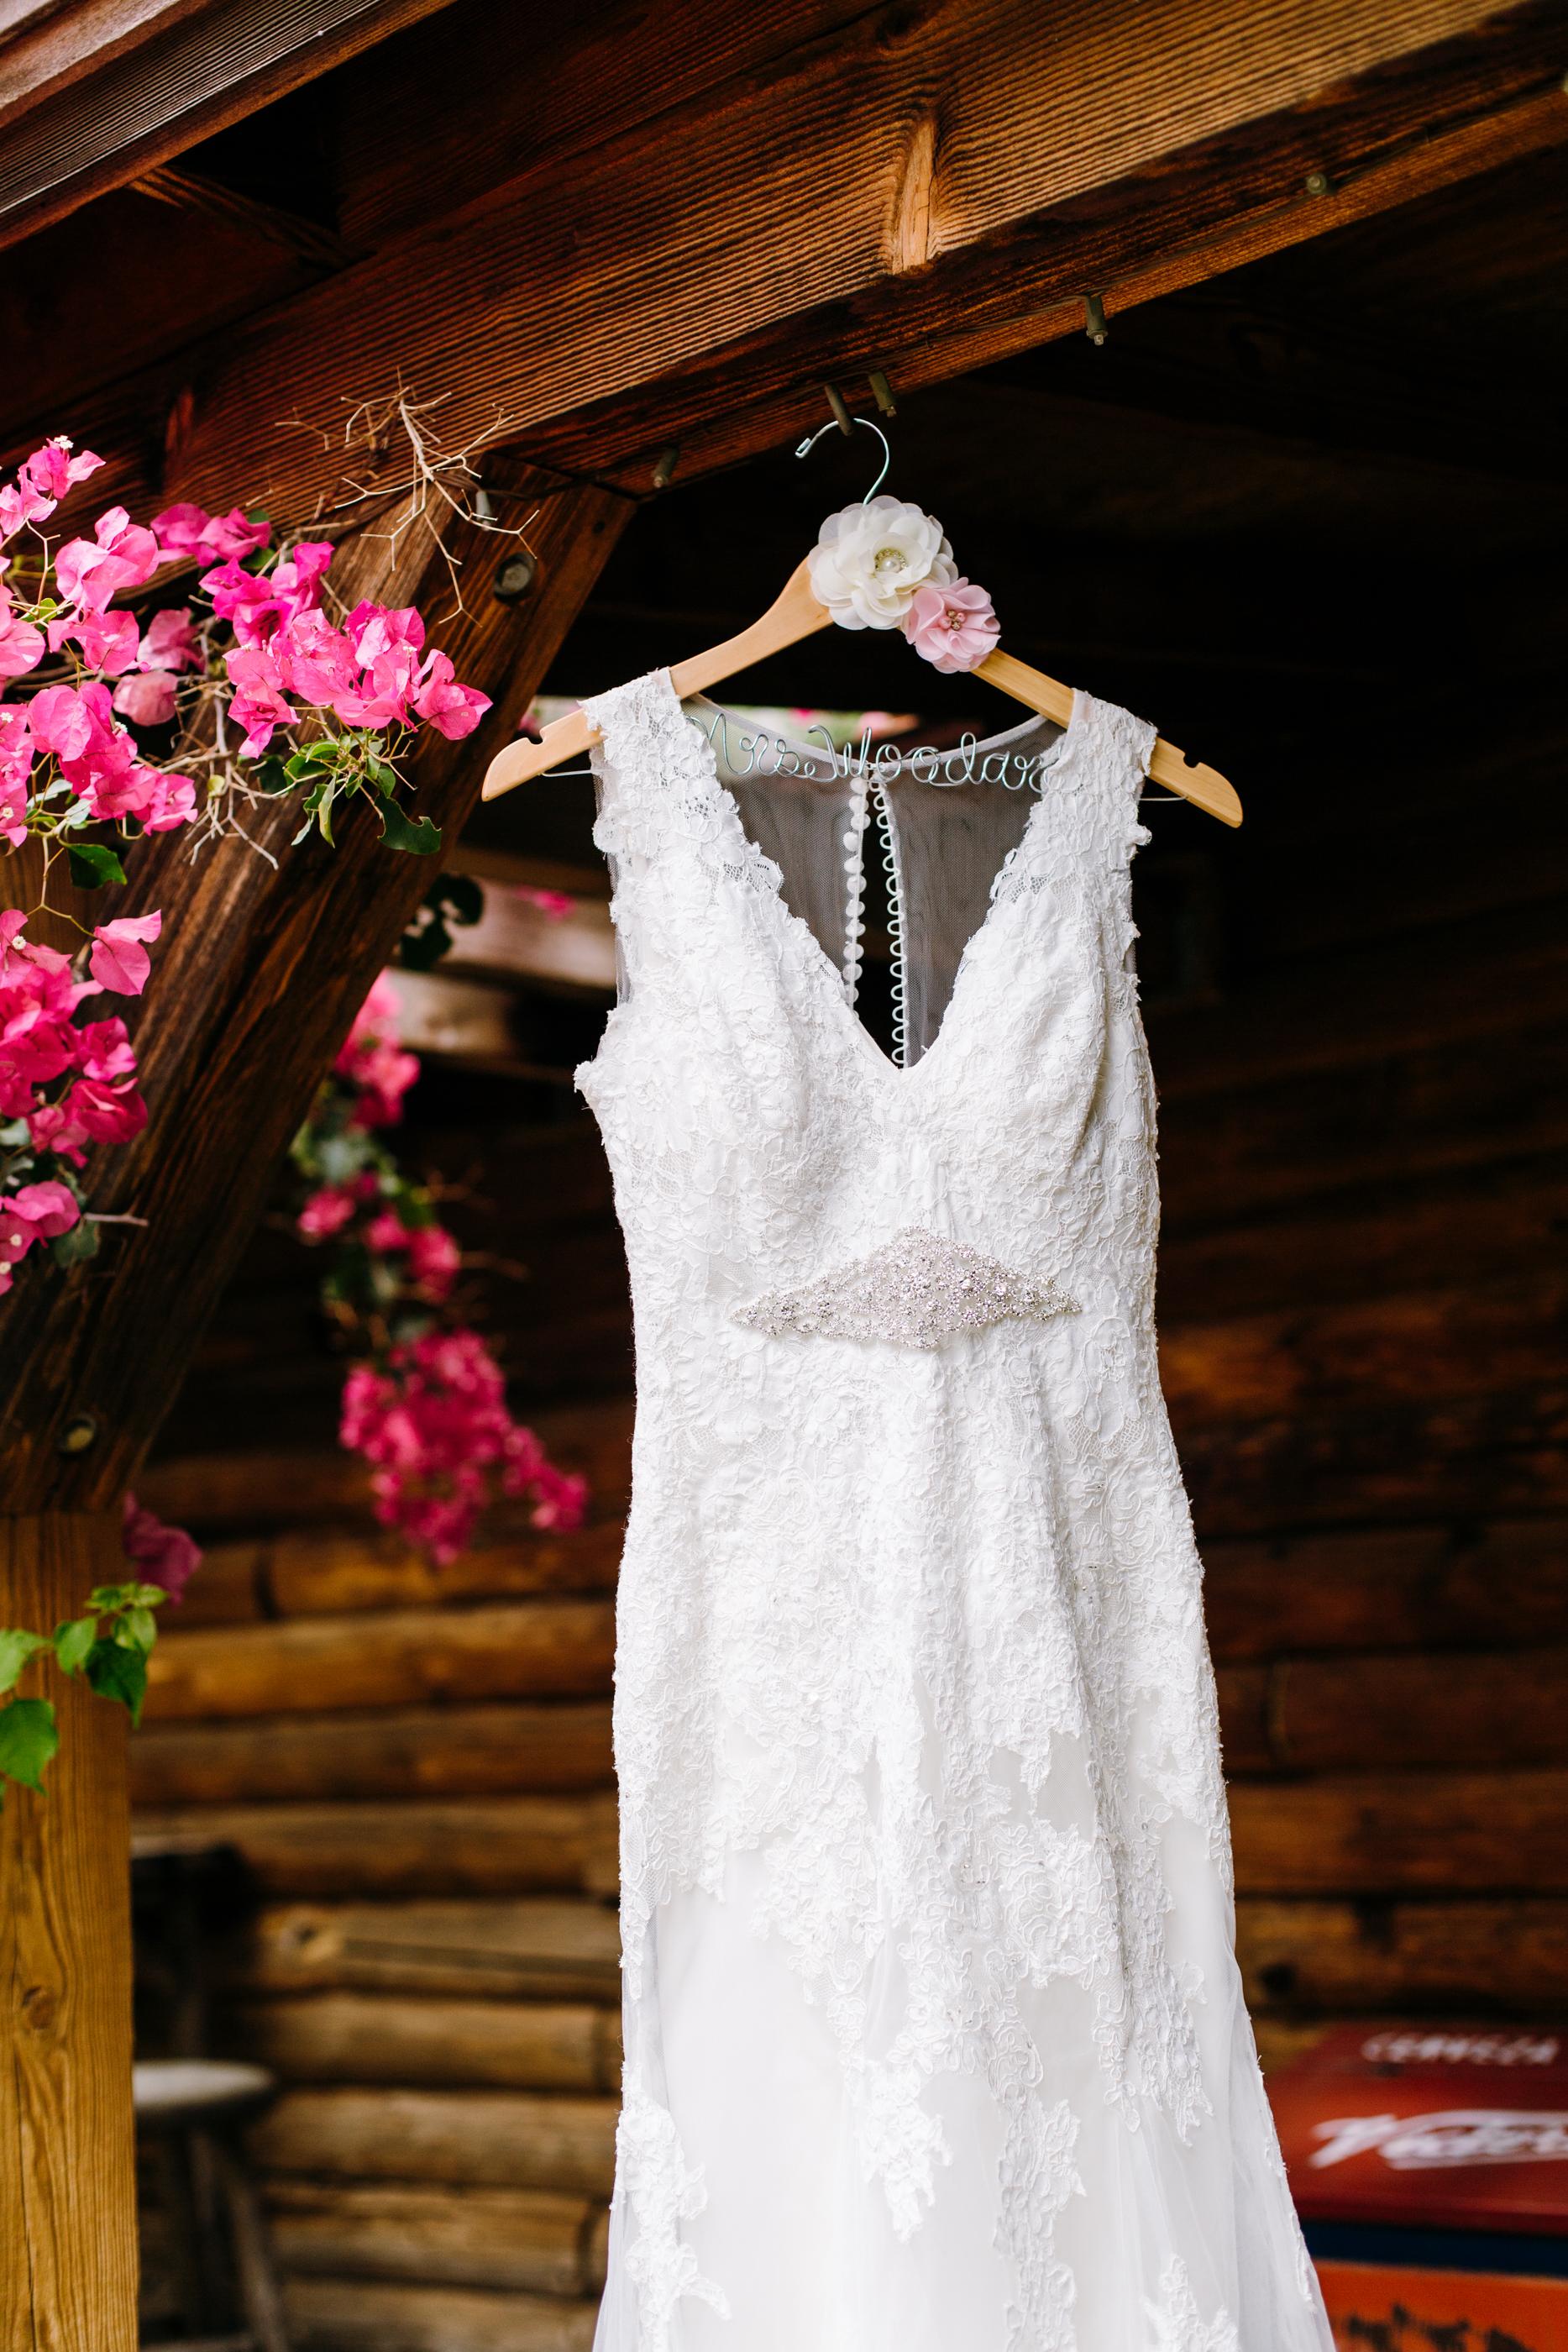 KaraNixonWeddings-LakeOakMeadows-Temecula-Wedding-3.jpg